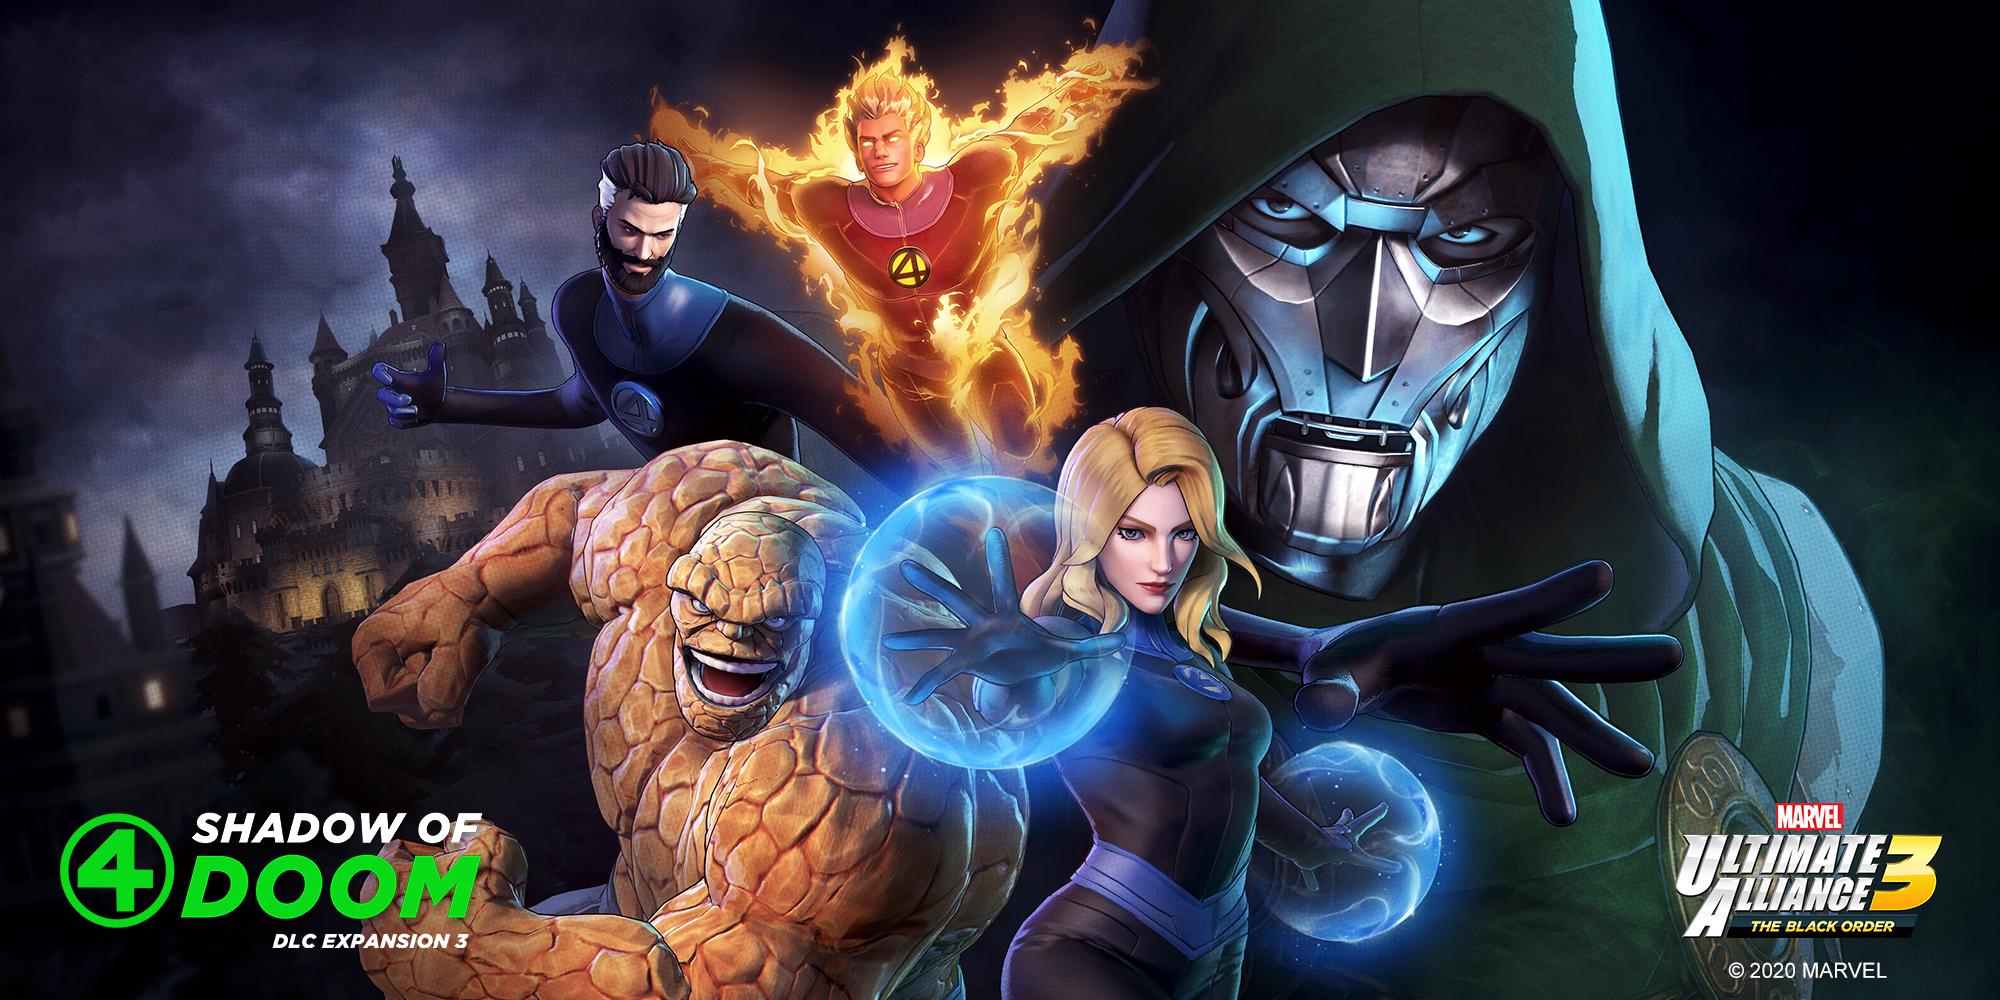 Названа дата выхода дополнения Fantastic Four: Shadow of Doom для Marvel Ultimate Alliance 3: The Black Order